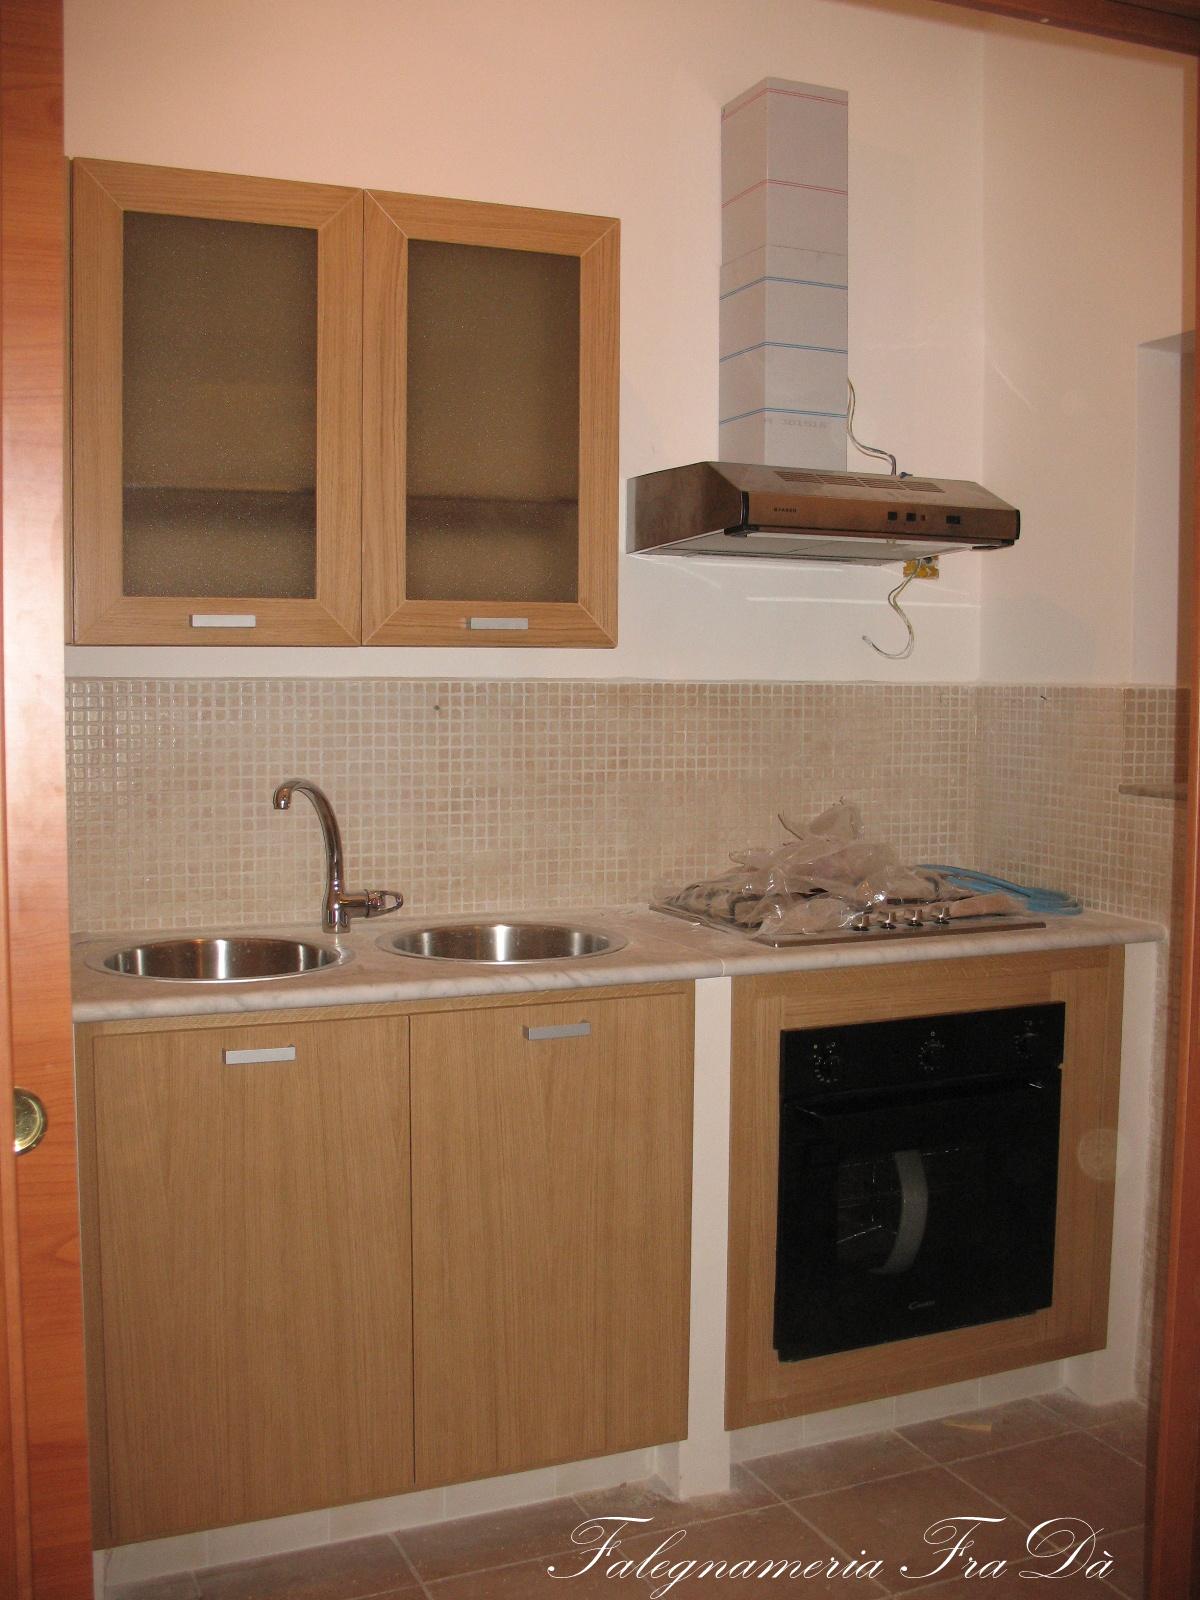 Cucina moderna rovere falegnameria frad falegname a - Cucina falegname ...